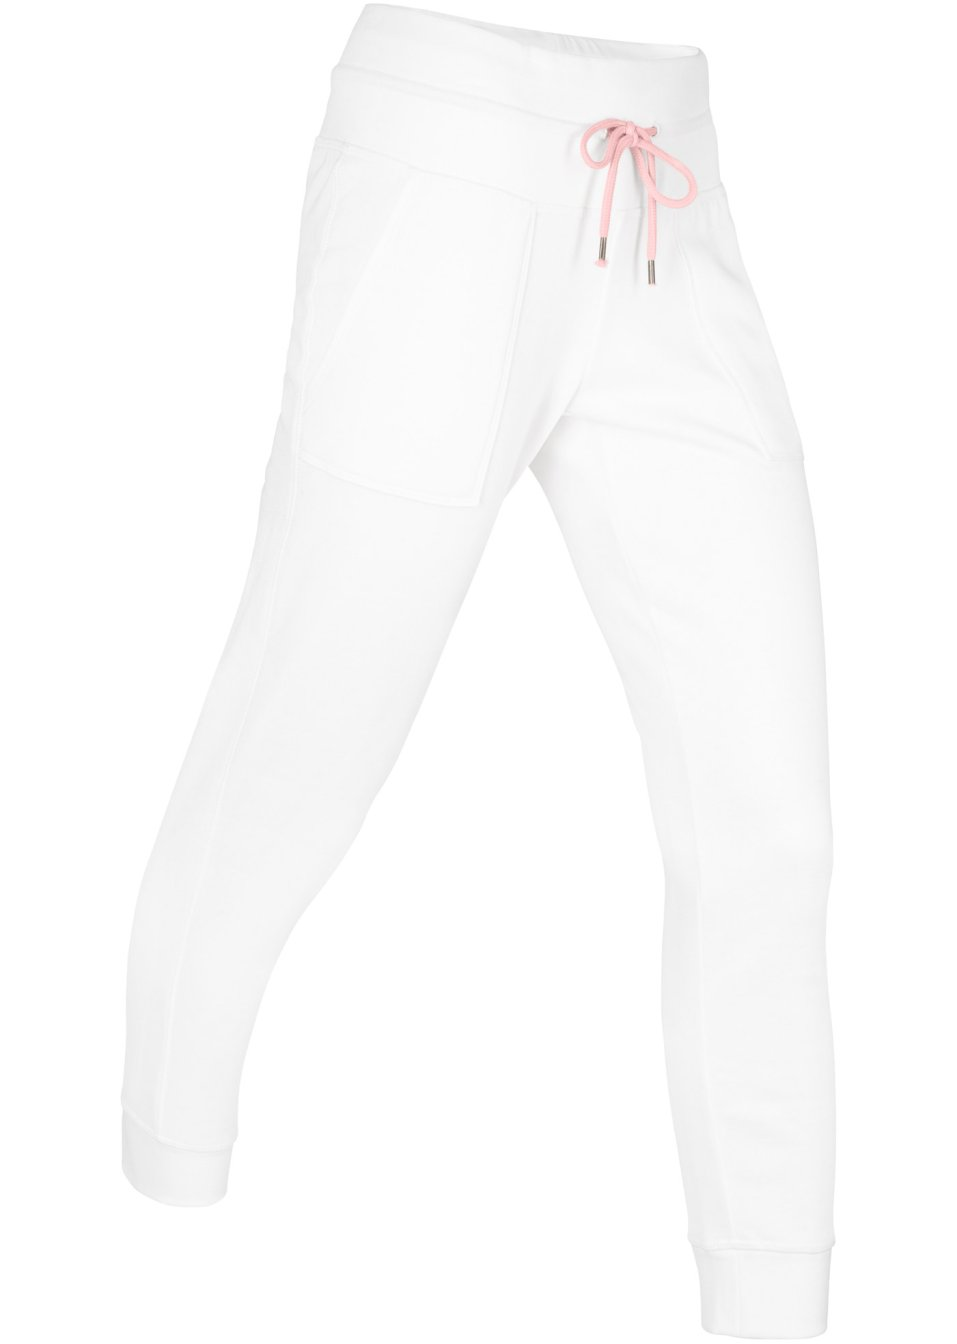 Komfortable Basic-Sweathose mit Gummibund - wollweiß 7a4eO JXAxU